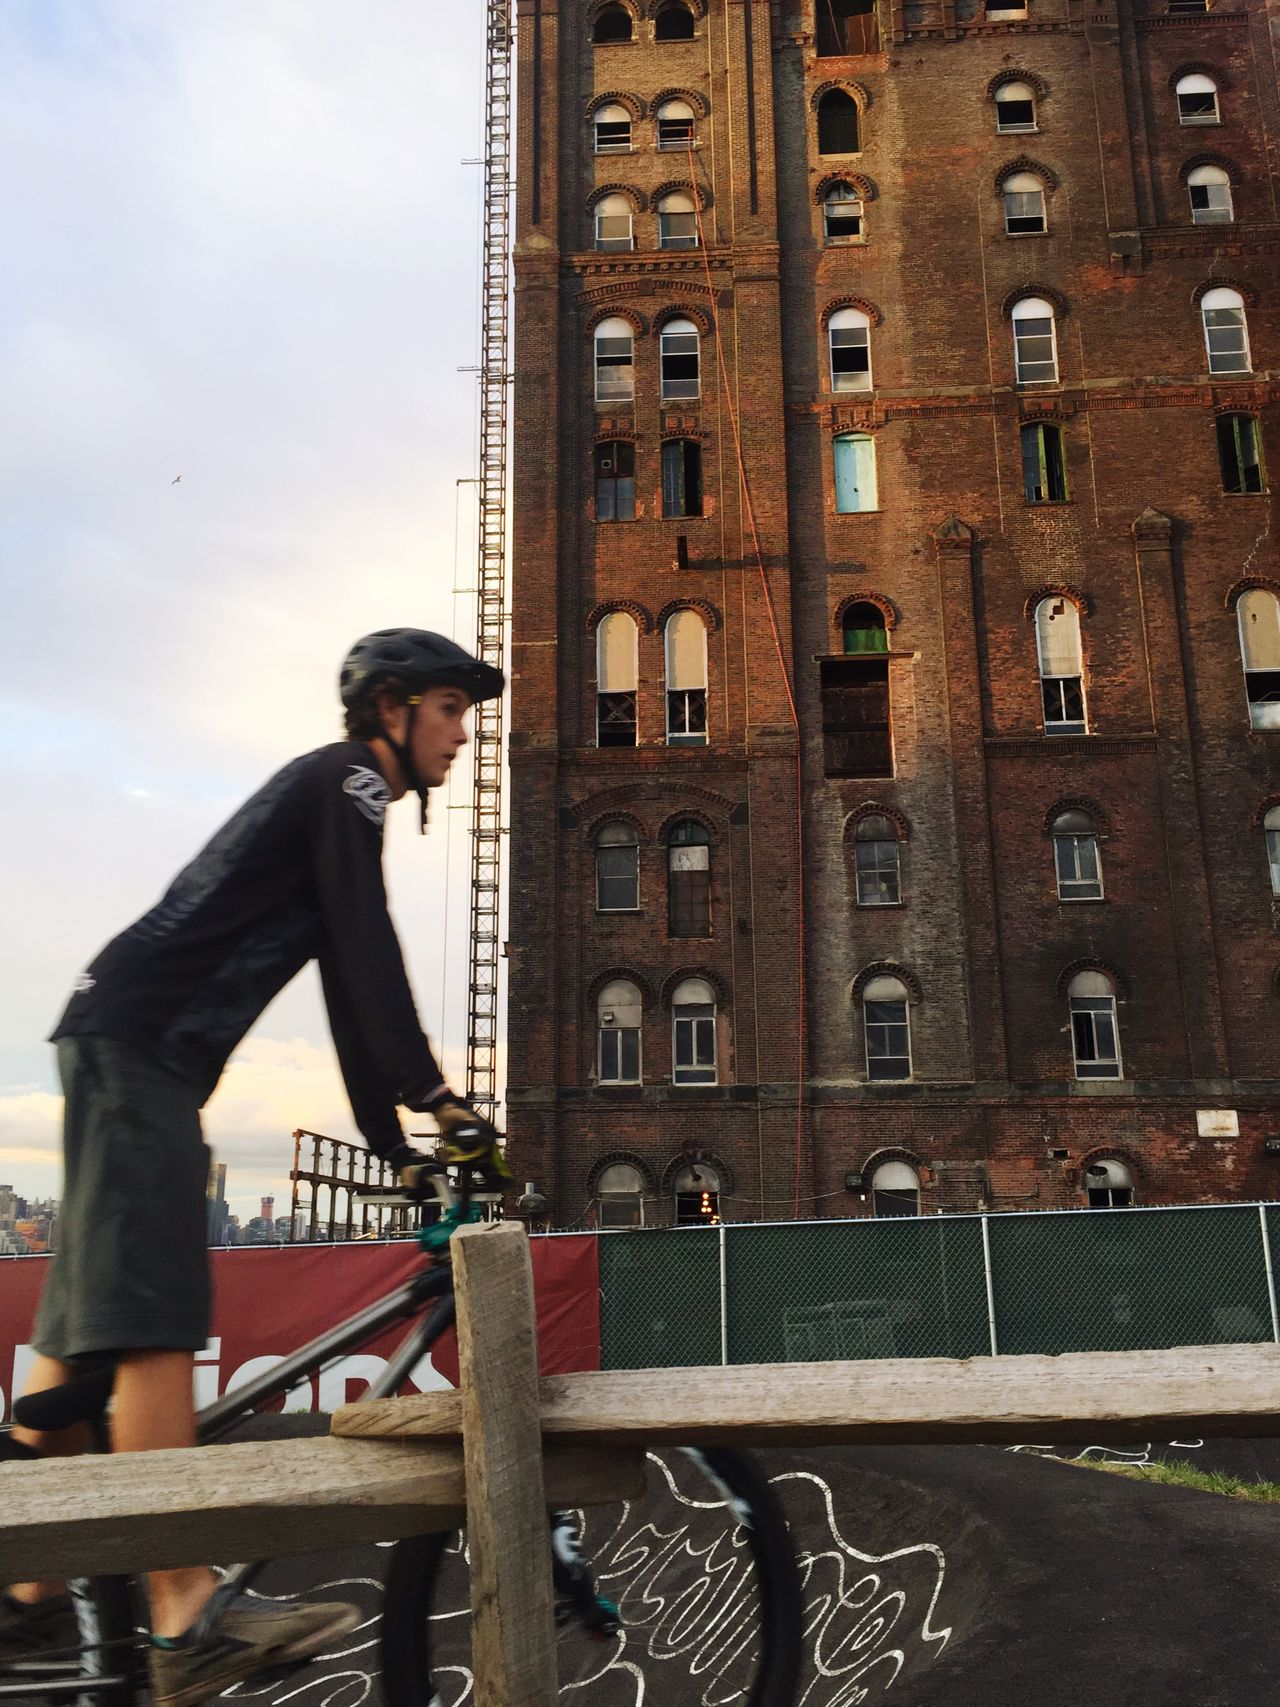 Bike Urban Outdoors Activity Contrast